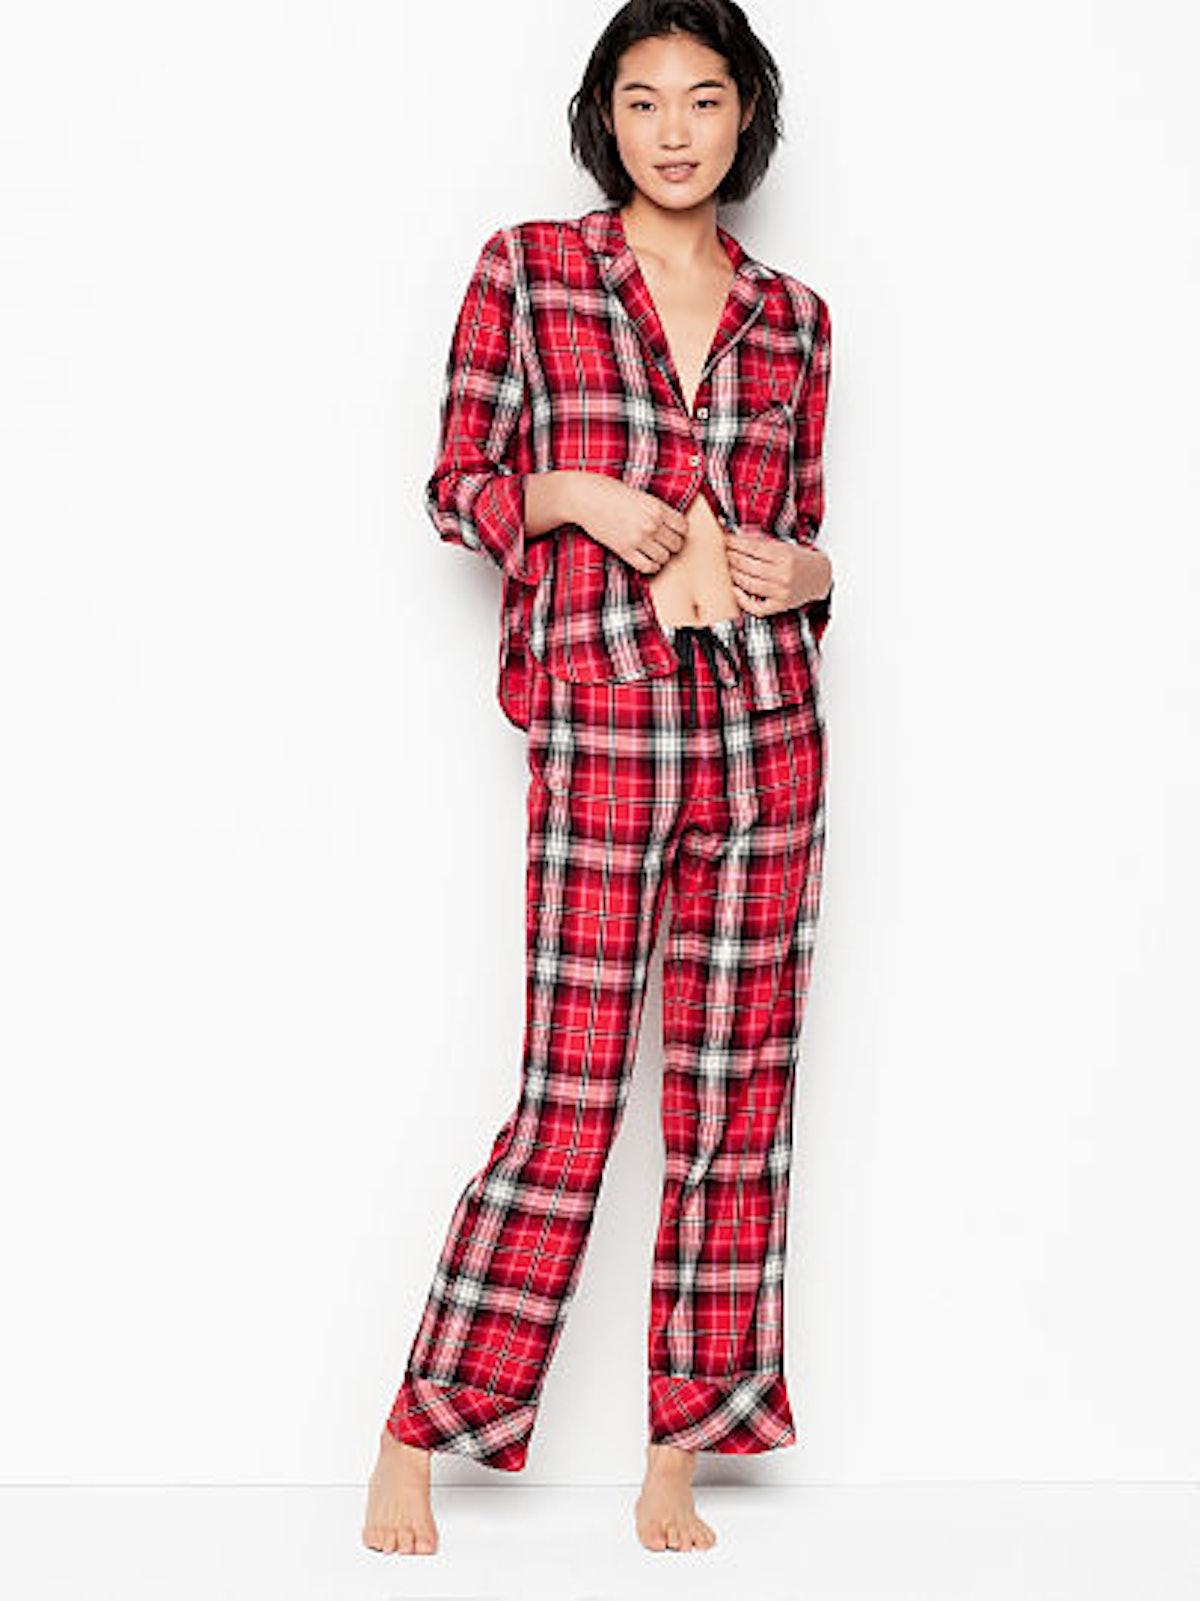 Flannel PJ Set in Bright Cherry Plaid